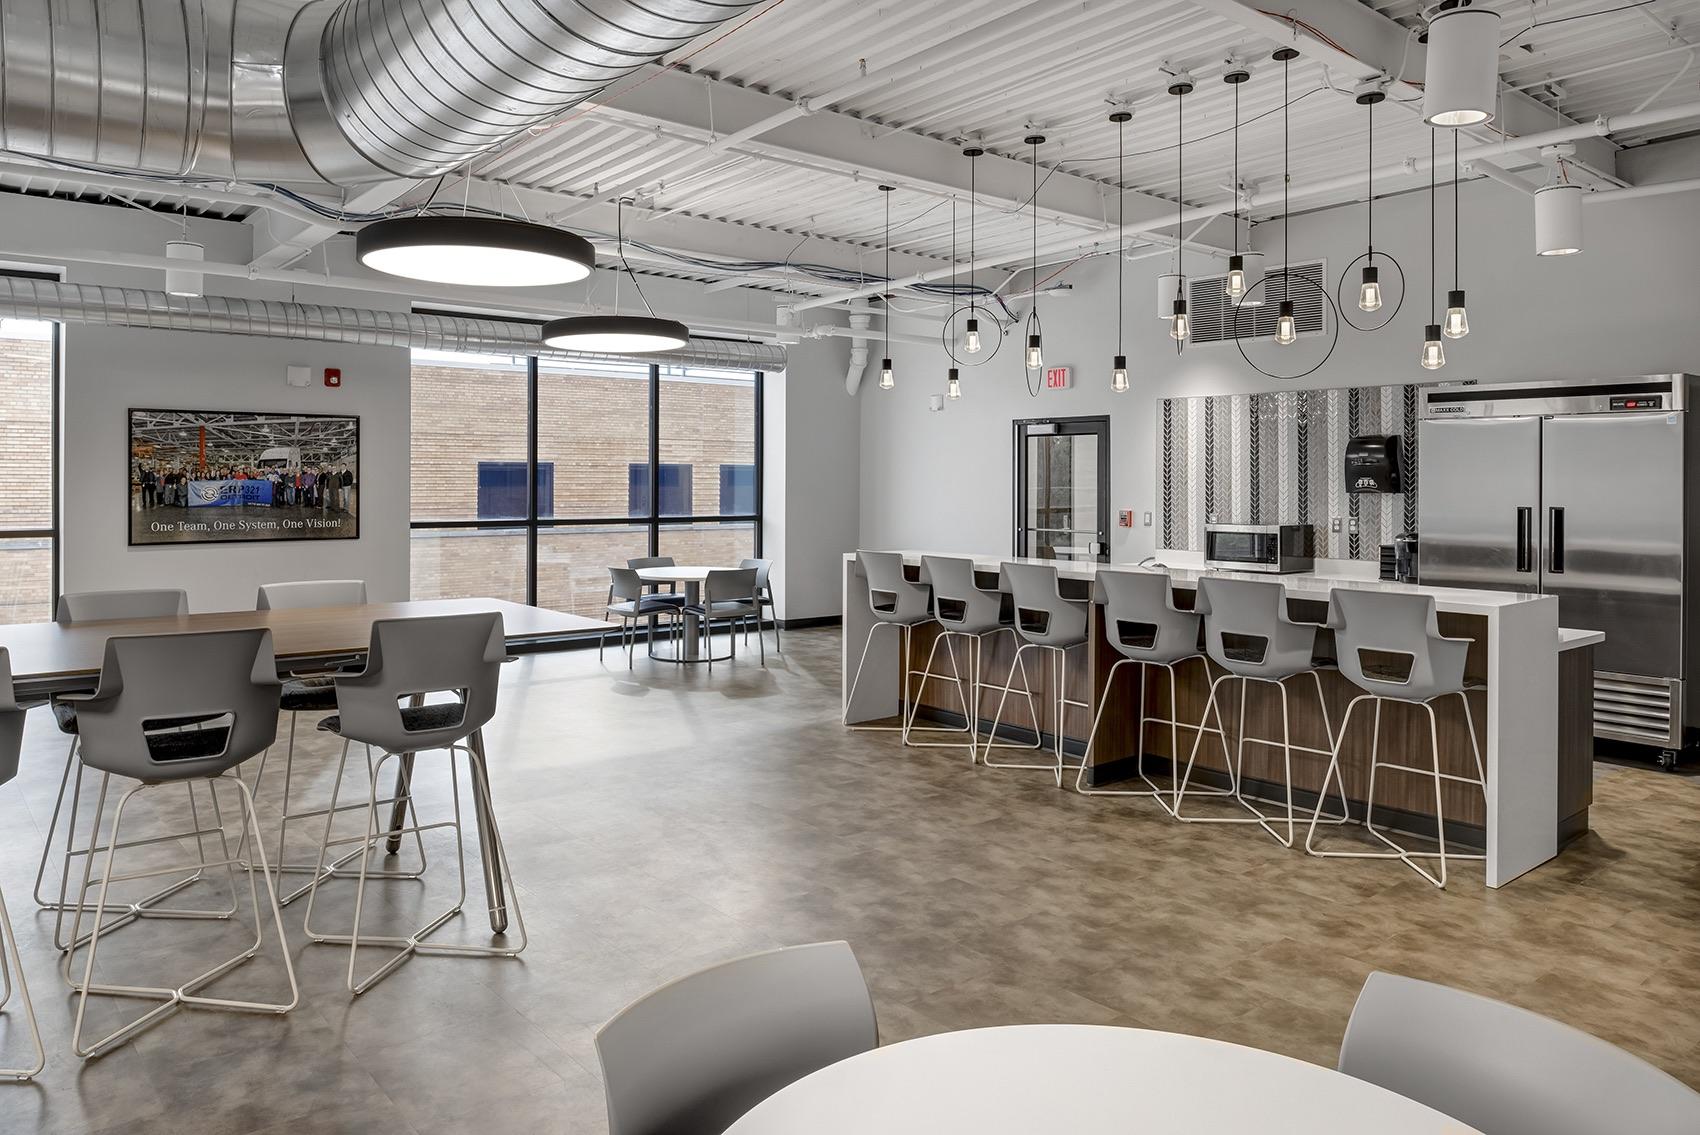 detroit-diesel-office-1